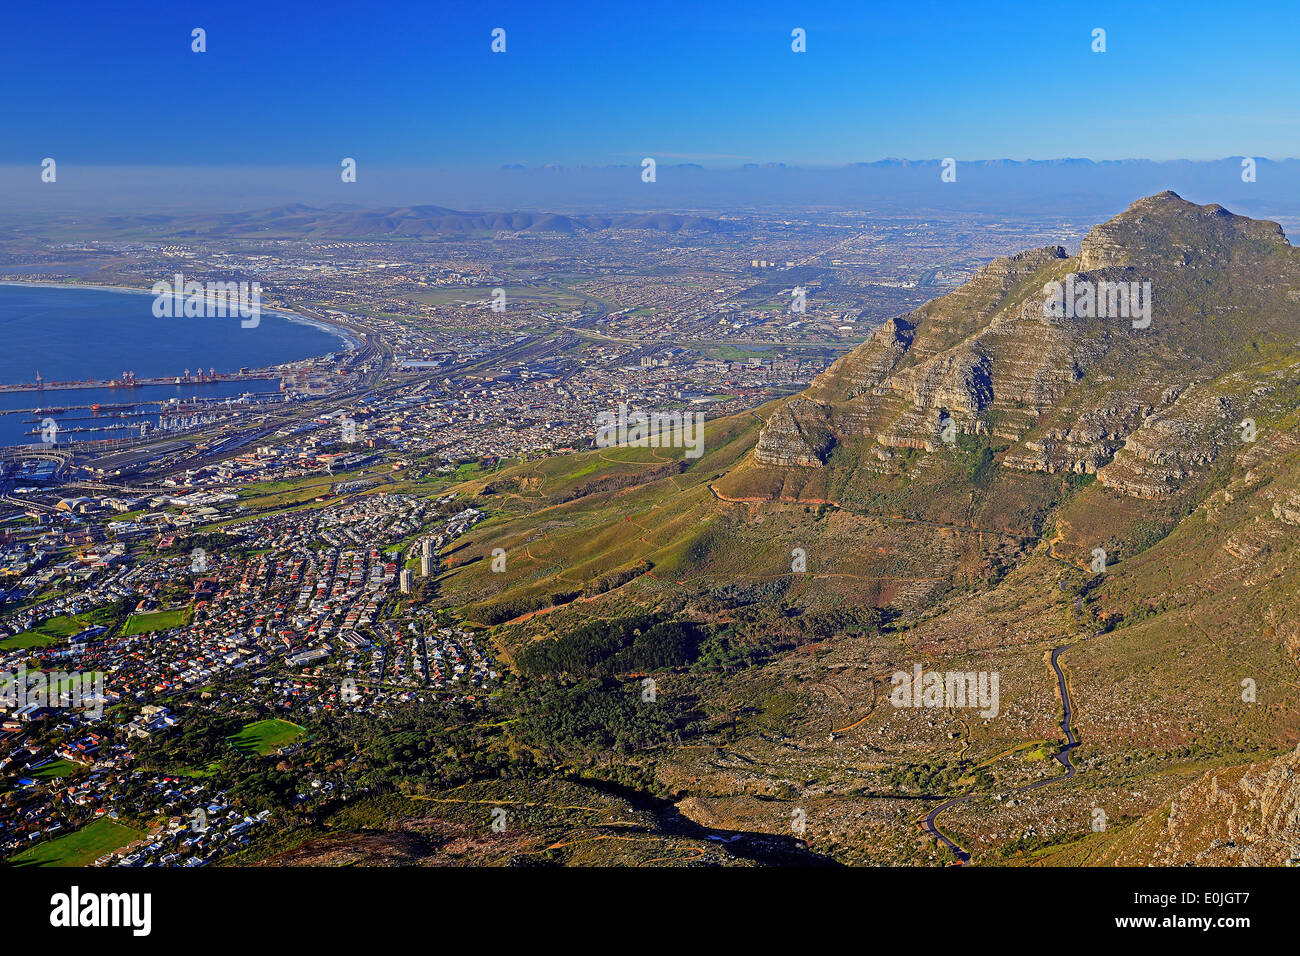 Blick vom Tafelberg auf Kapstadt am Abend, Western Cape, Westkap, Suedafrika, Afrika - Stock Image